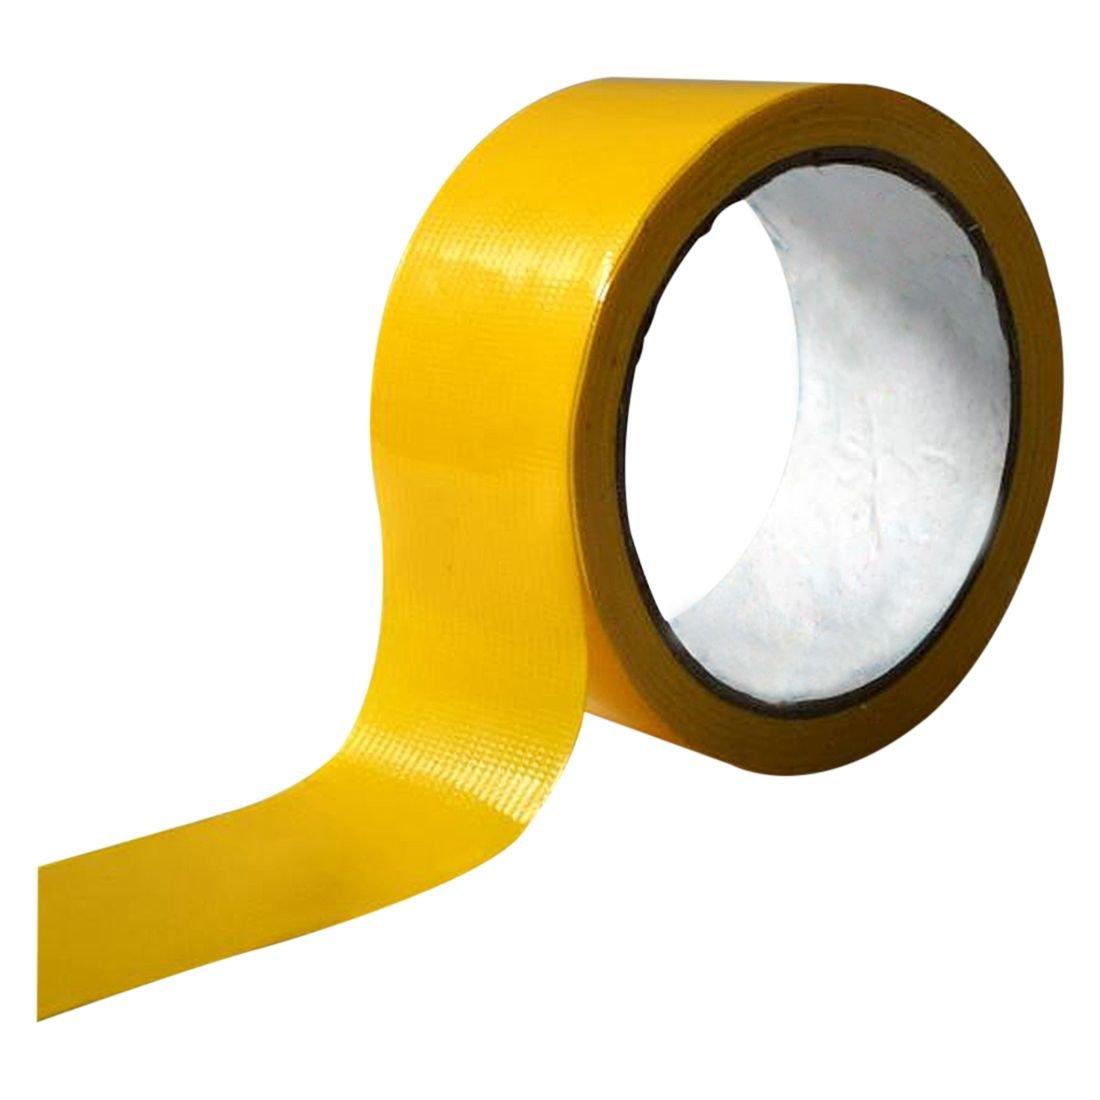 TOOGOO(R) Hot melt adhesive Tape Pipeline Waterproof Tape 48mm50m, Yellow